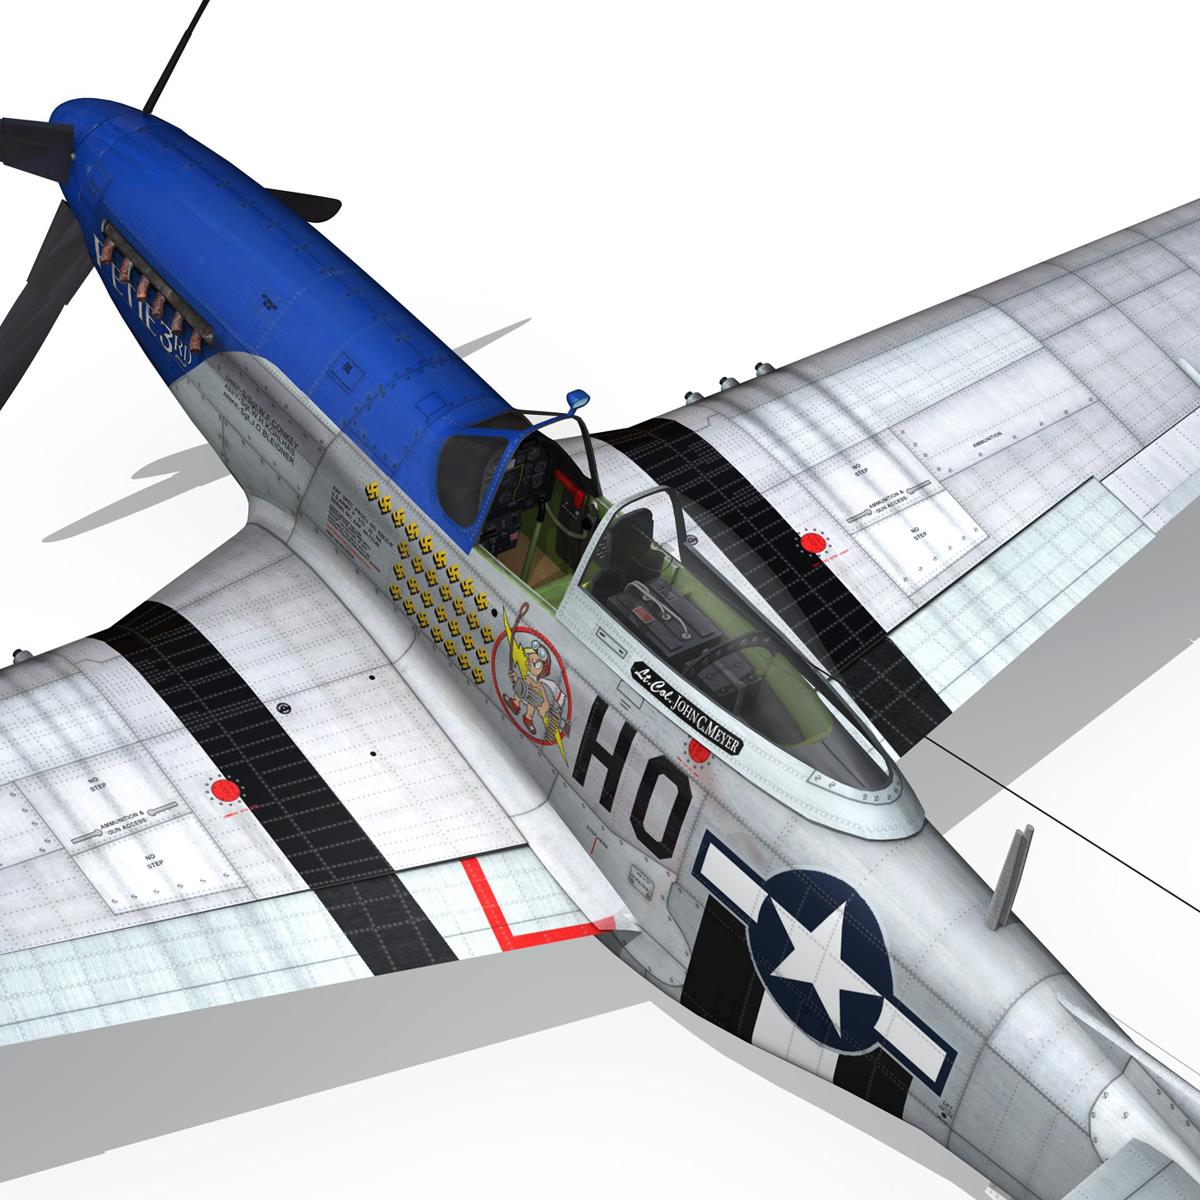 north american p-51d mustang – petie 3rd 3d model fbx c4d lwo obj 280143